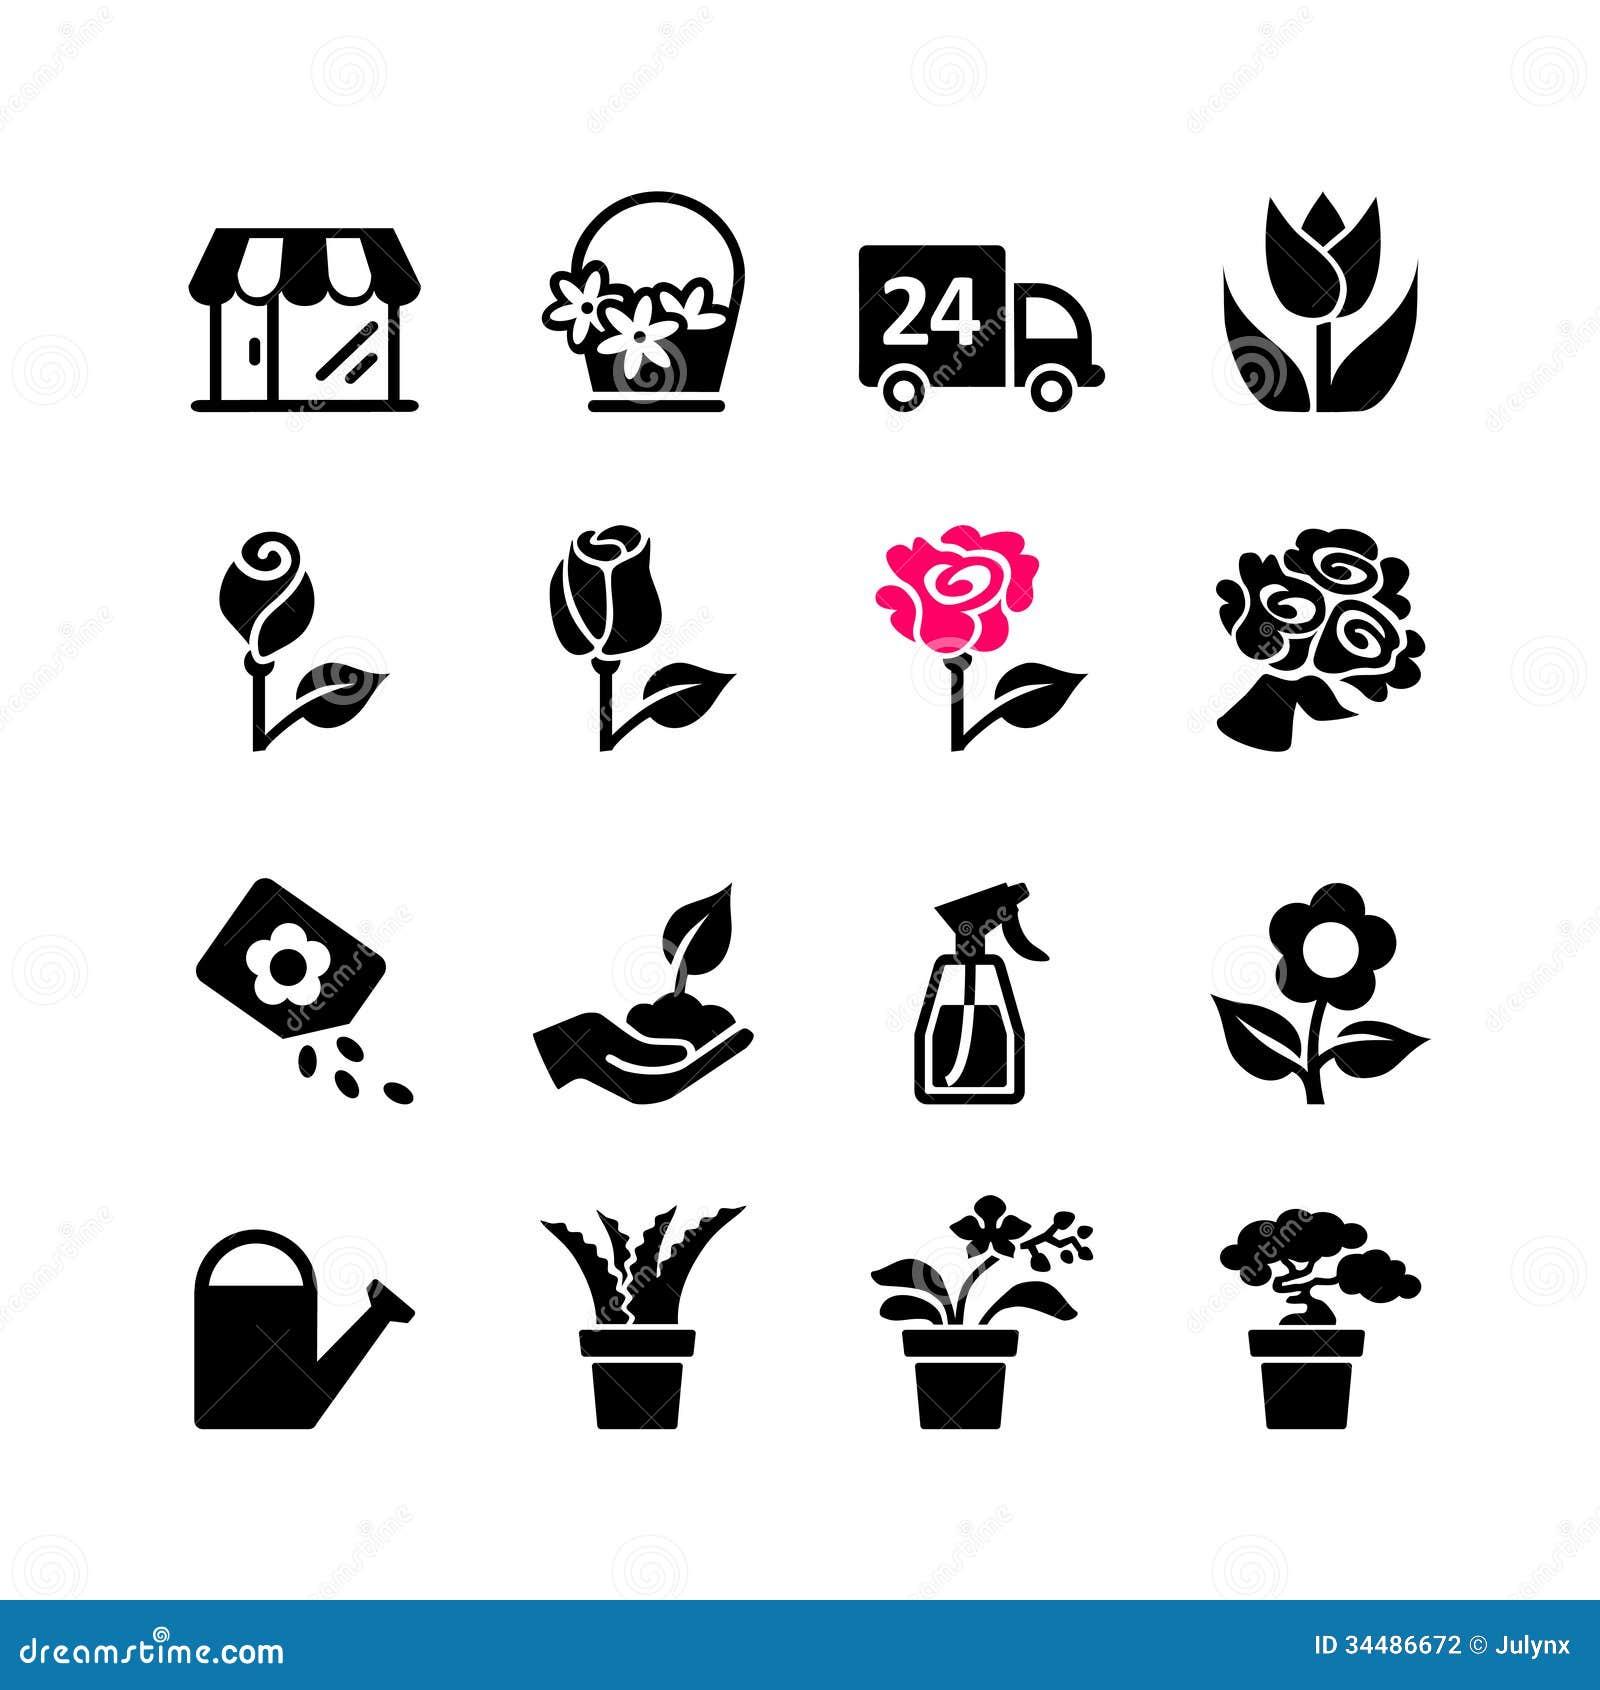 Flower Shop Stock Vector. Illustration Of